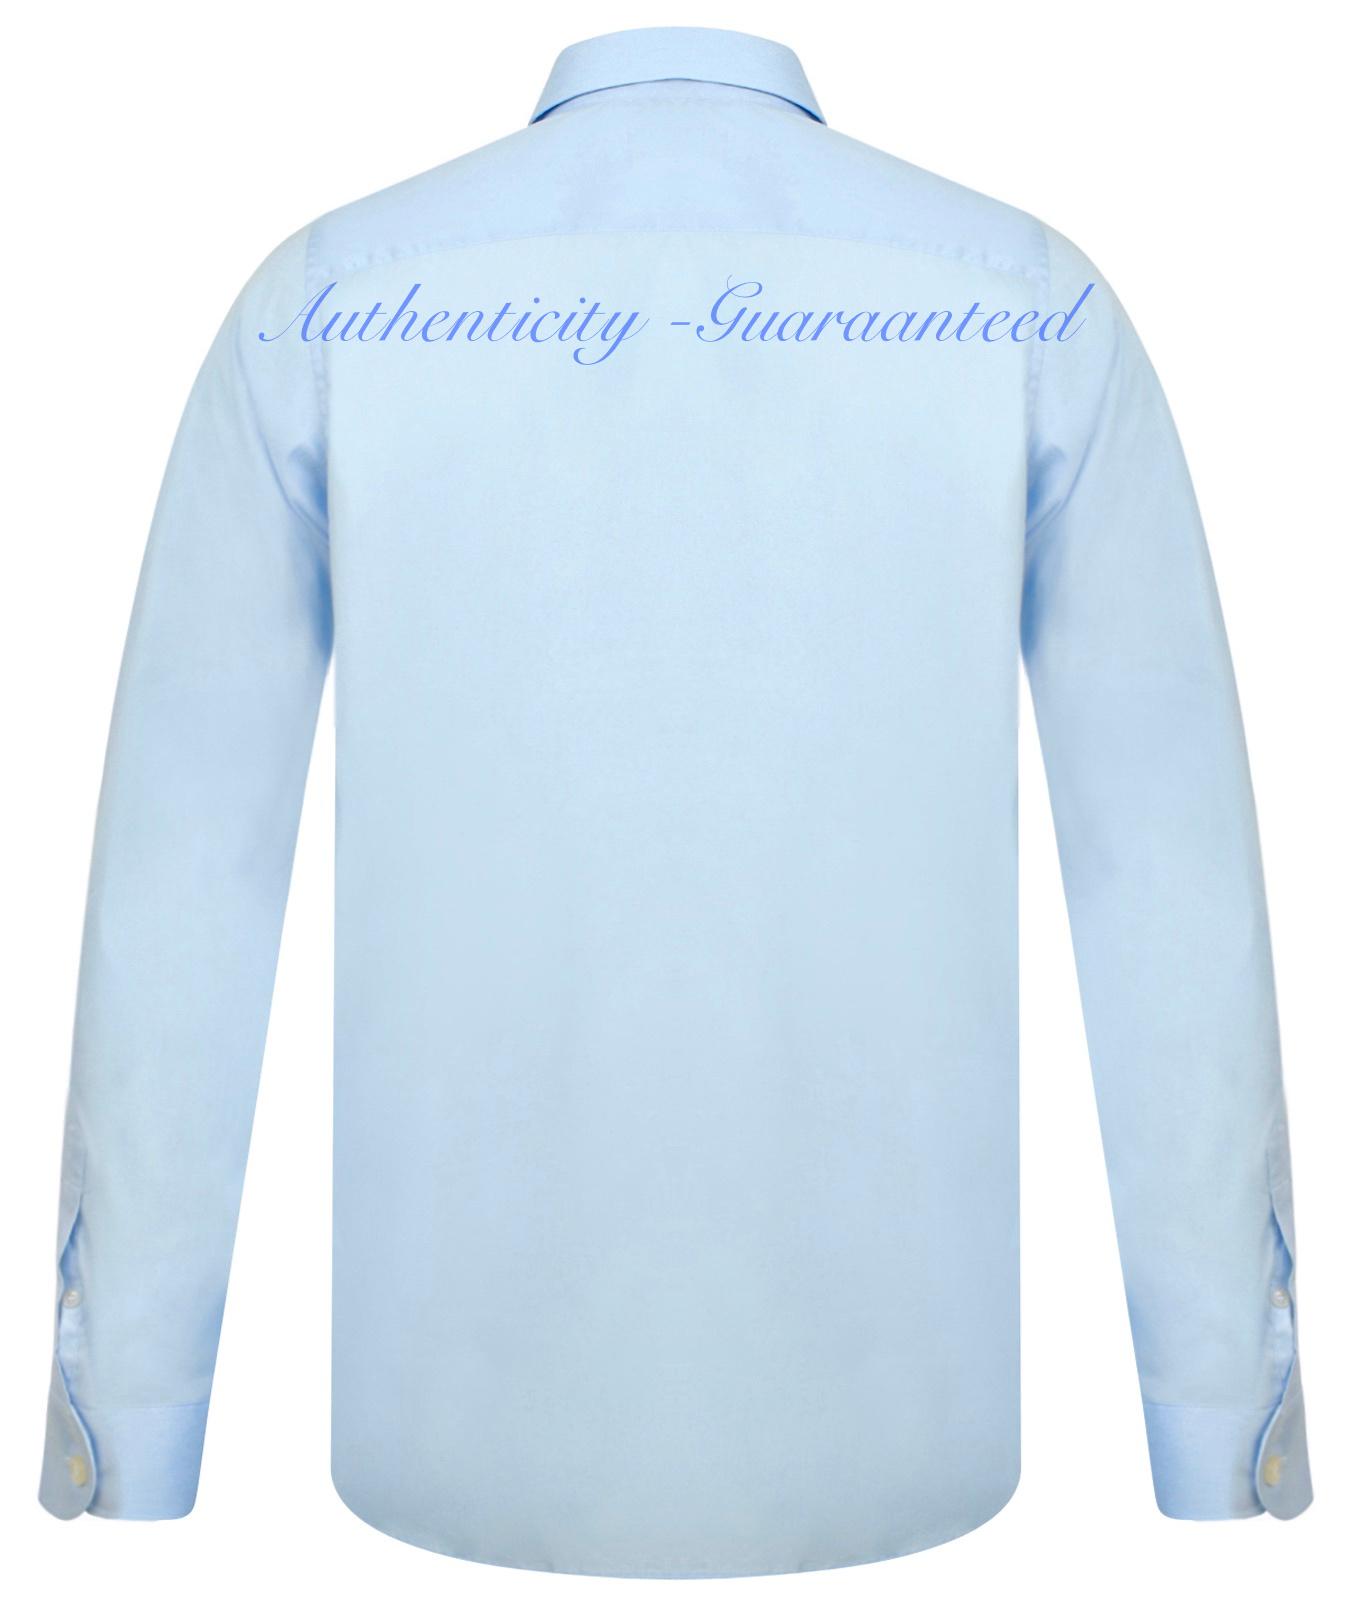 Lacoste Men/'s Short Sleeve Linen Shirt Blue Turquoise RRP £100 BNWT SALE!